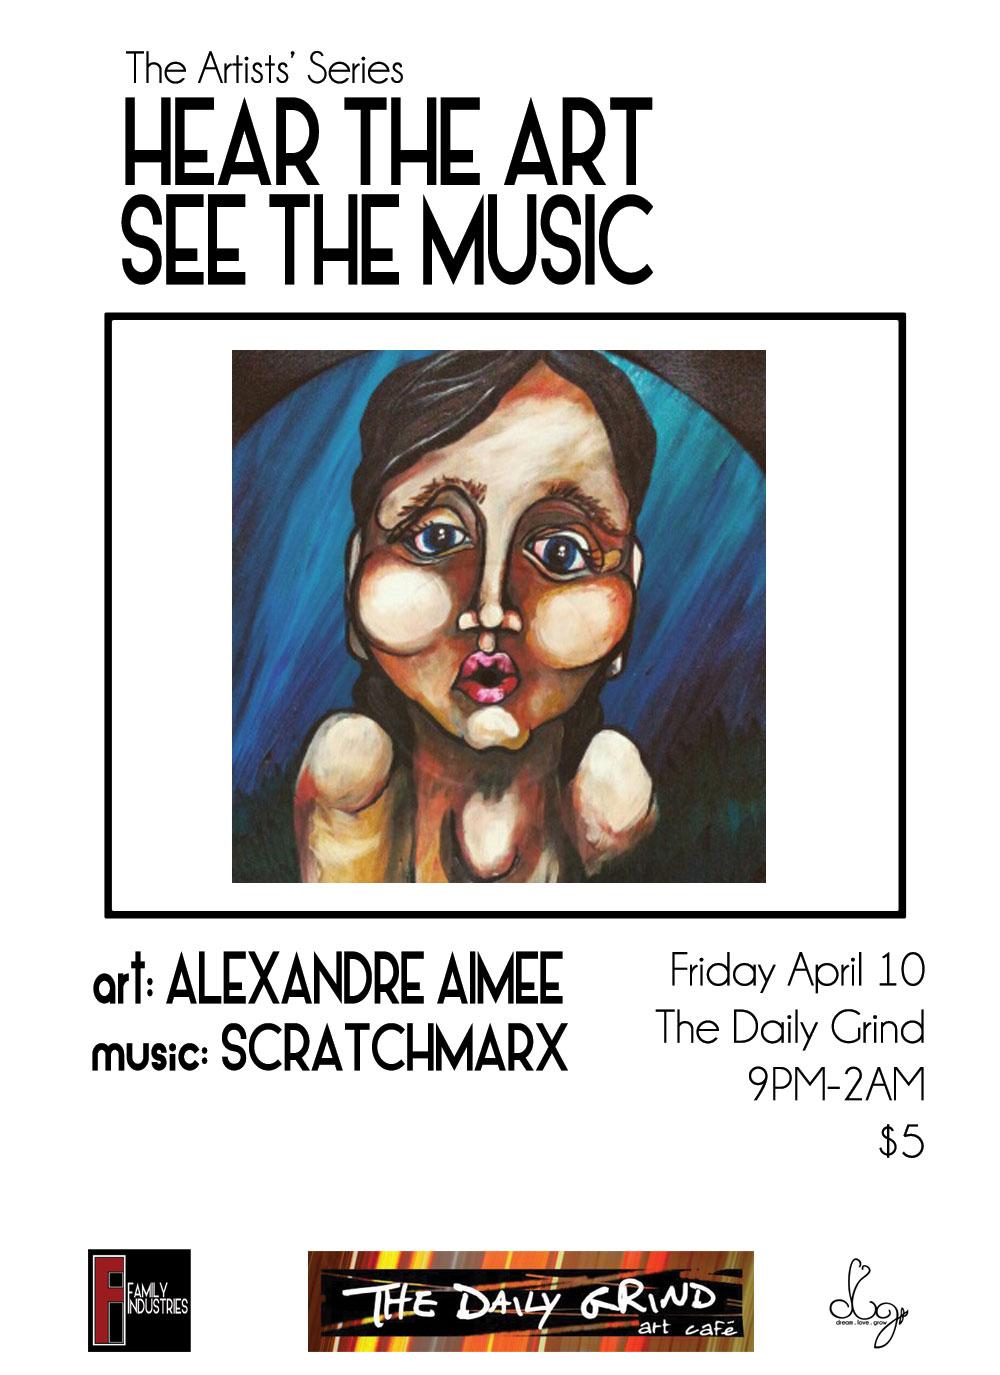 The-Artists-Series-Alexandre-Aimee.jpg